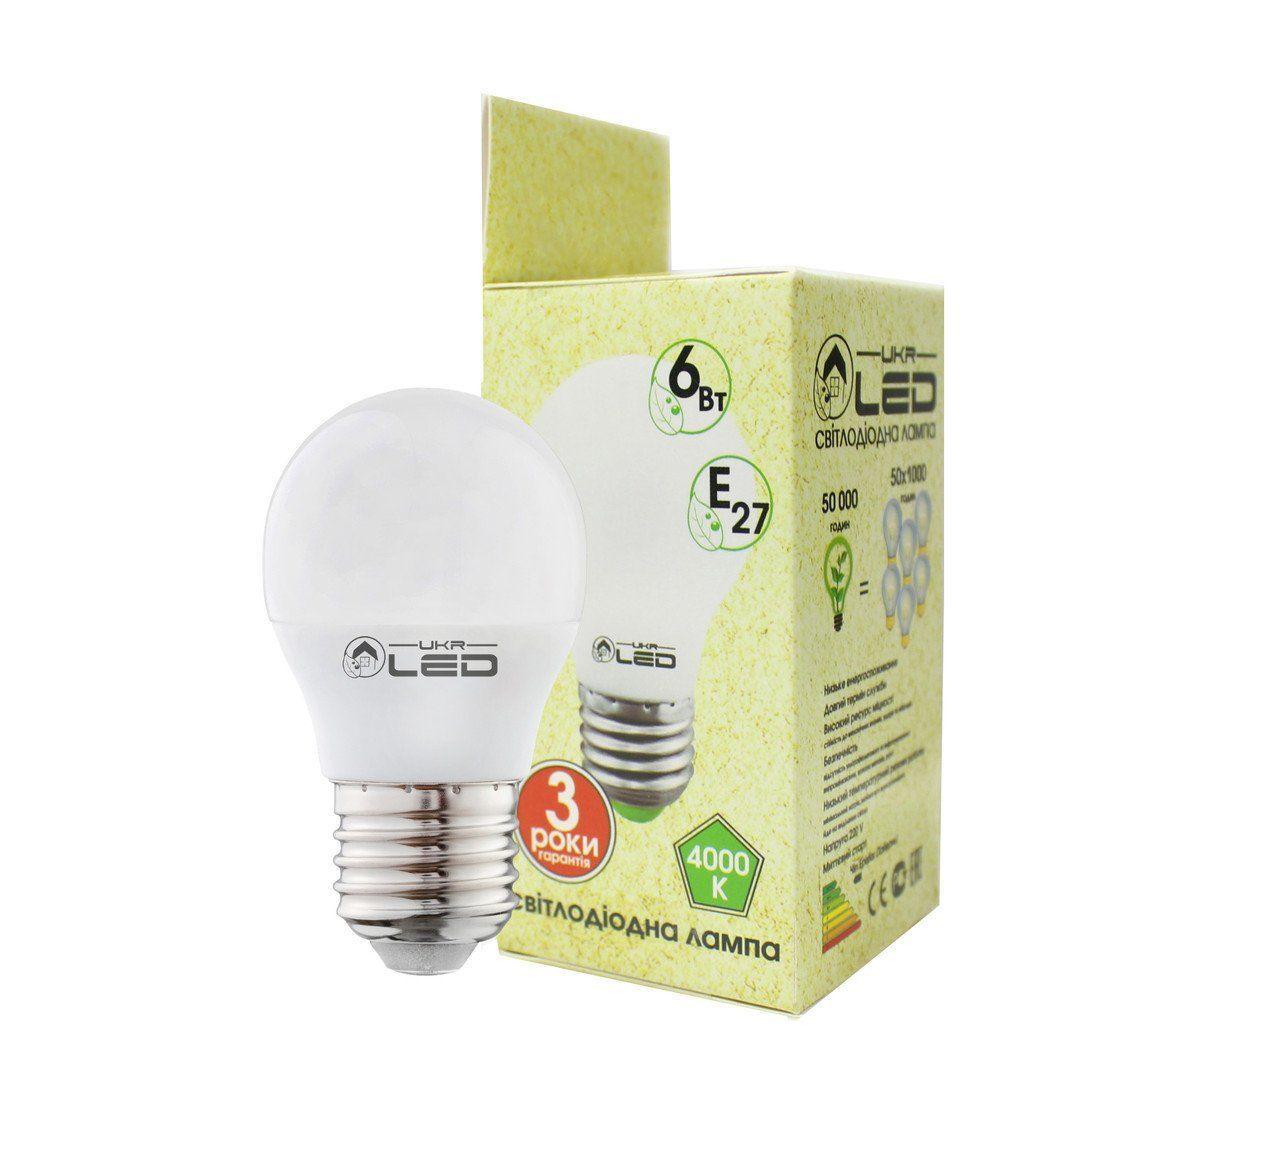 Светодиодная лампа UkrLed Е27 6W (Шарик) 4000К (179)